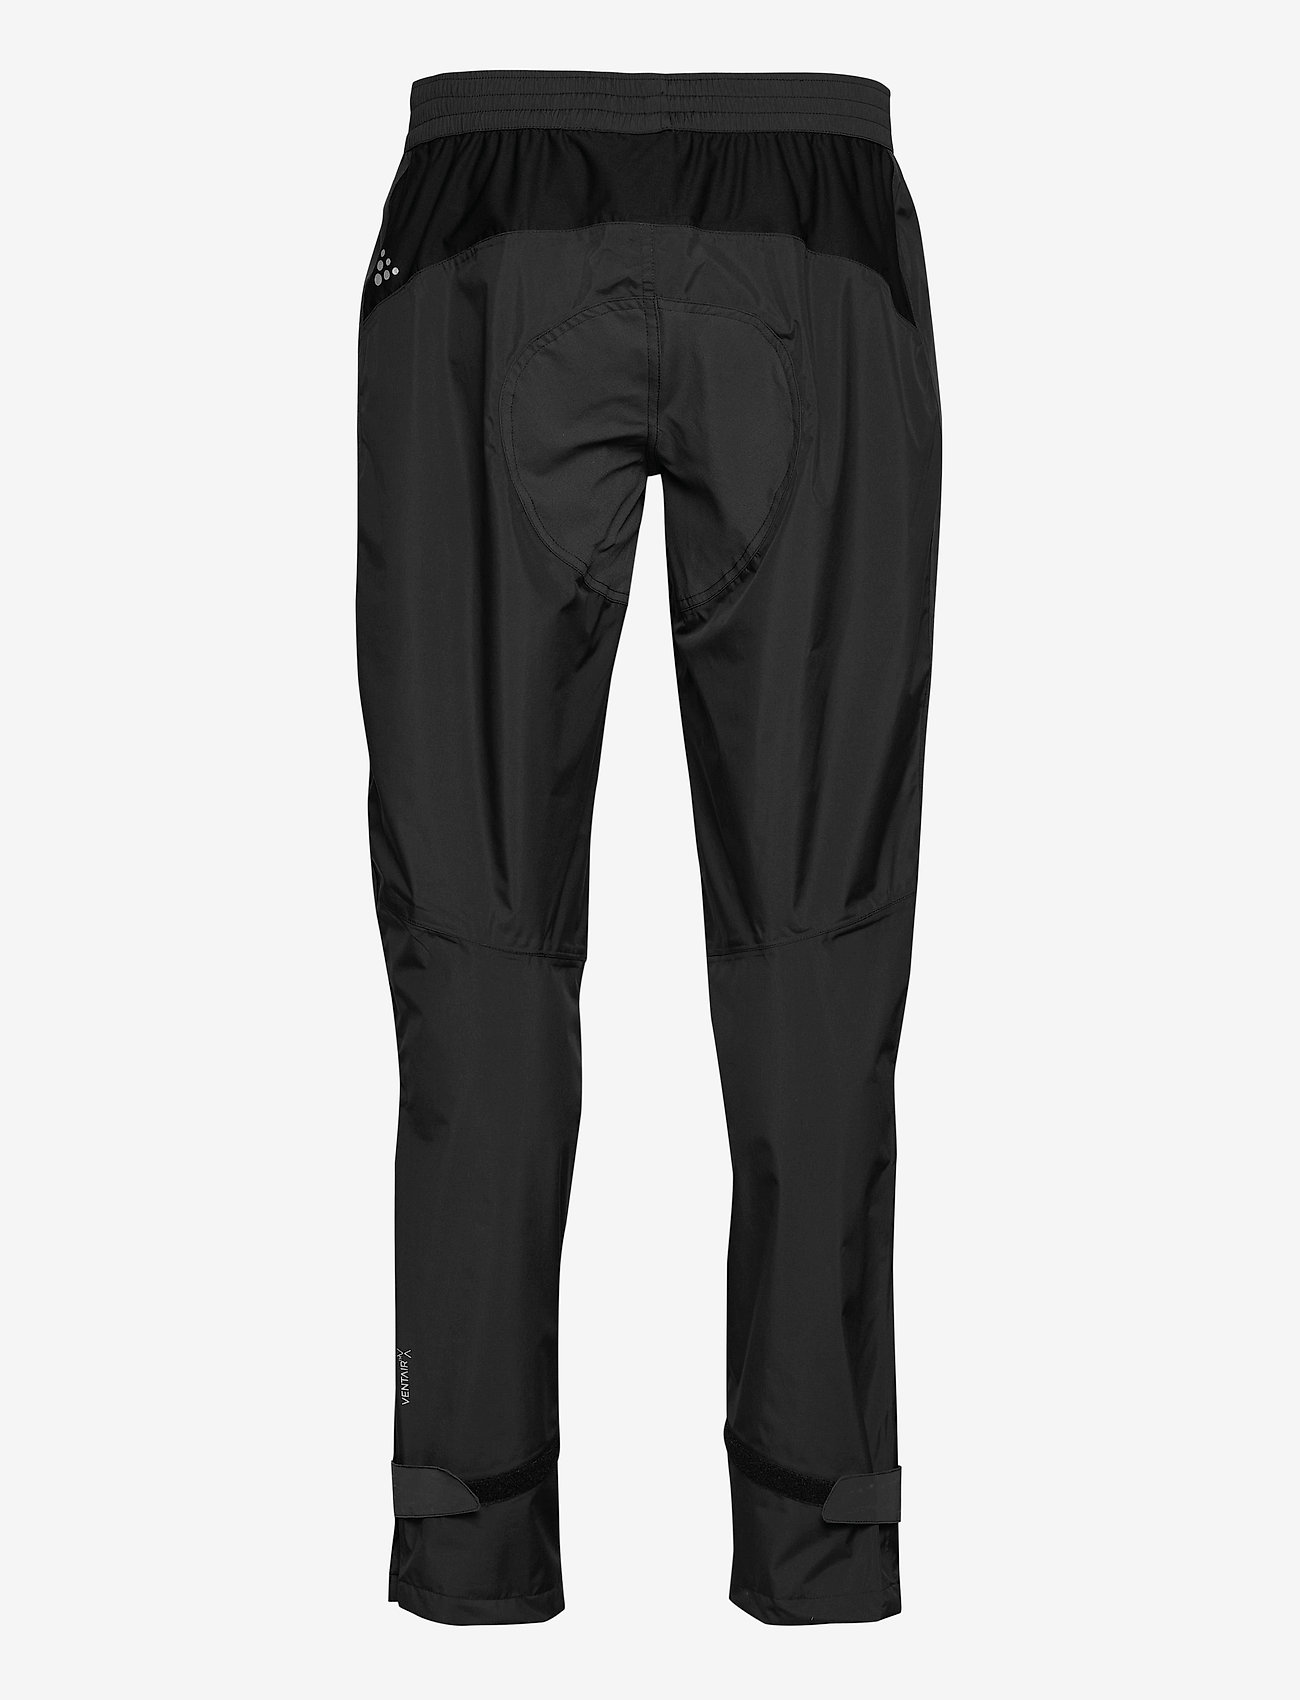 Craft - Core Endur Hydro Pants M - spodenki i getry kolarskie - black - 1